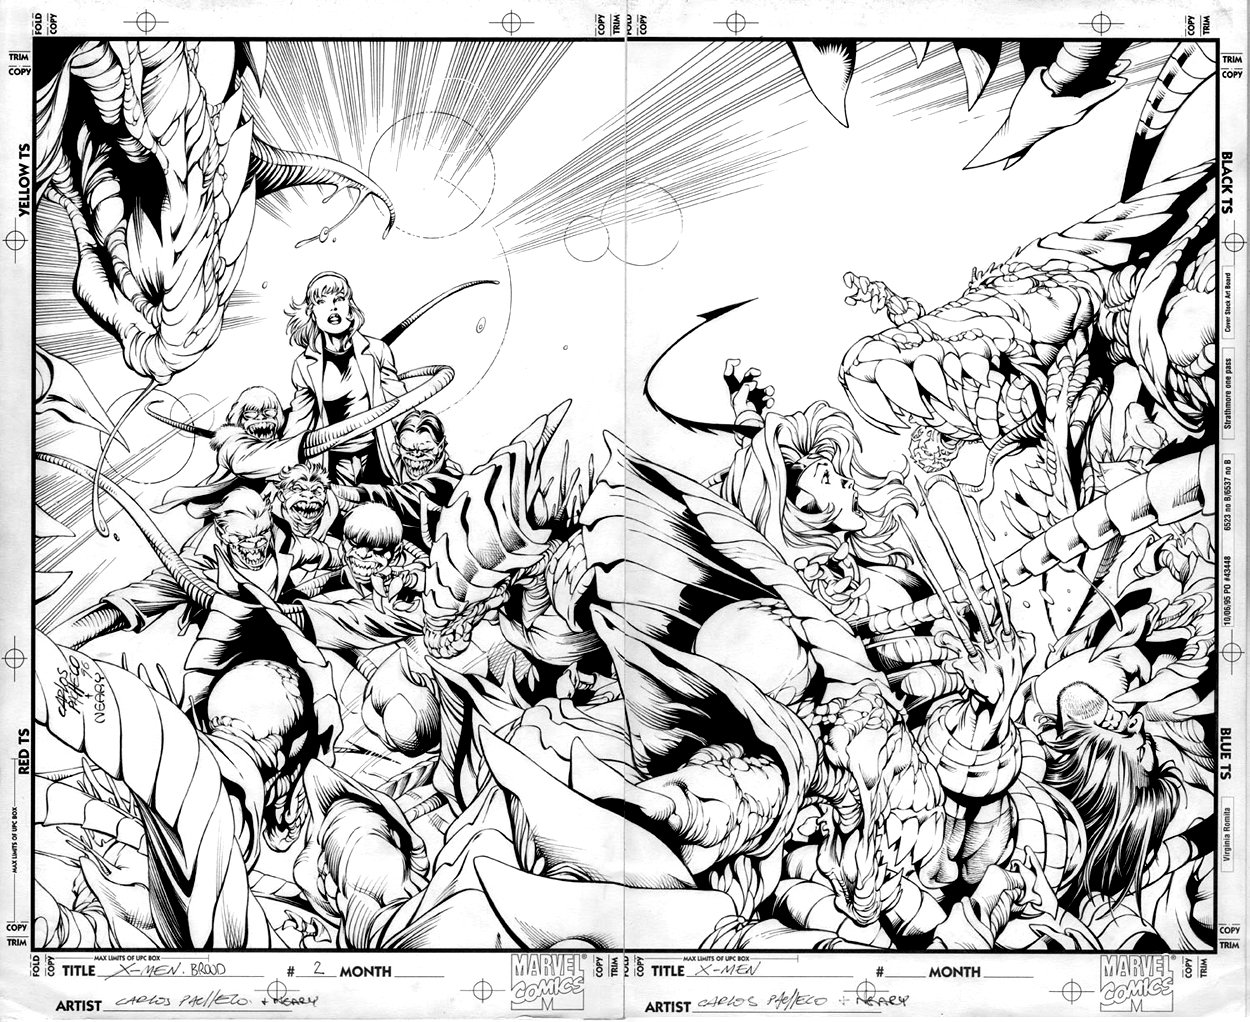 X-Men vs. The Brood #2 Wraparound Cover (1996)